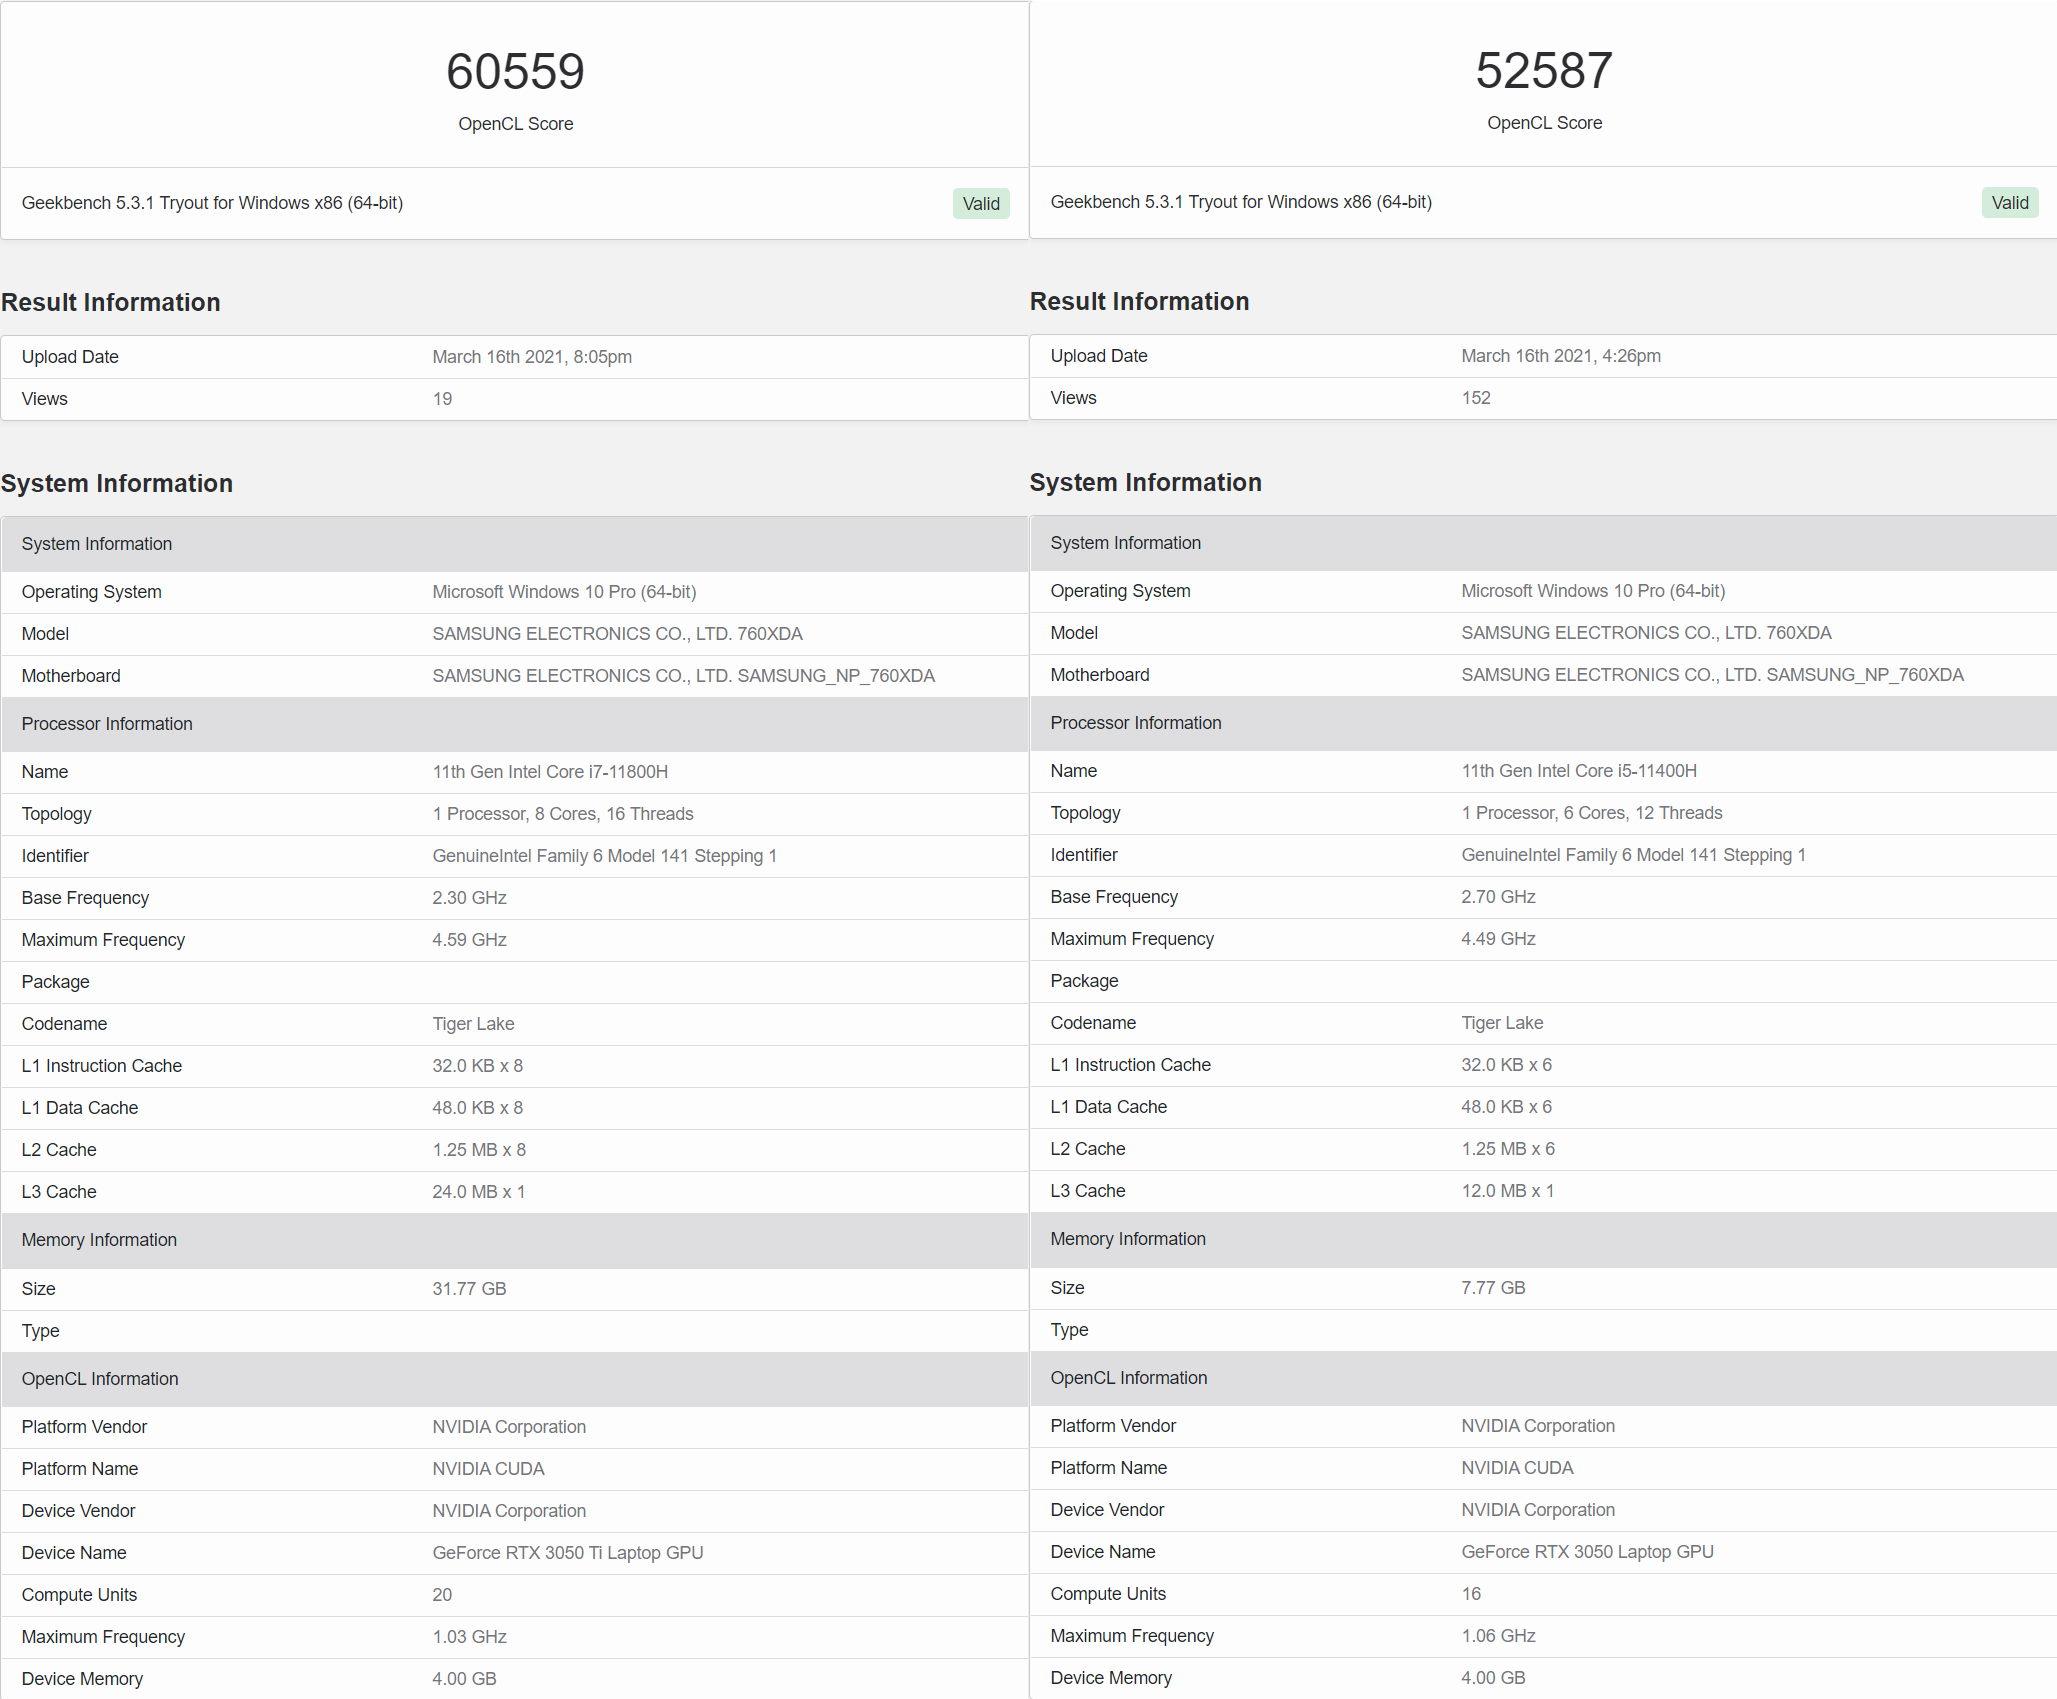 Geekbench 資料庫中關於 GeForce RTX 3050 系列筆電版雙顯卡的規格和效能。